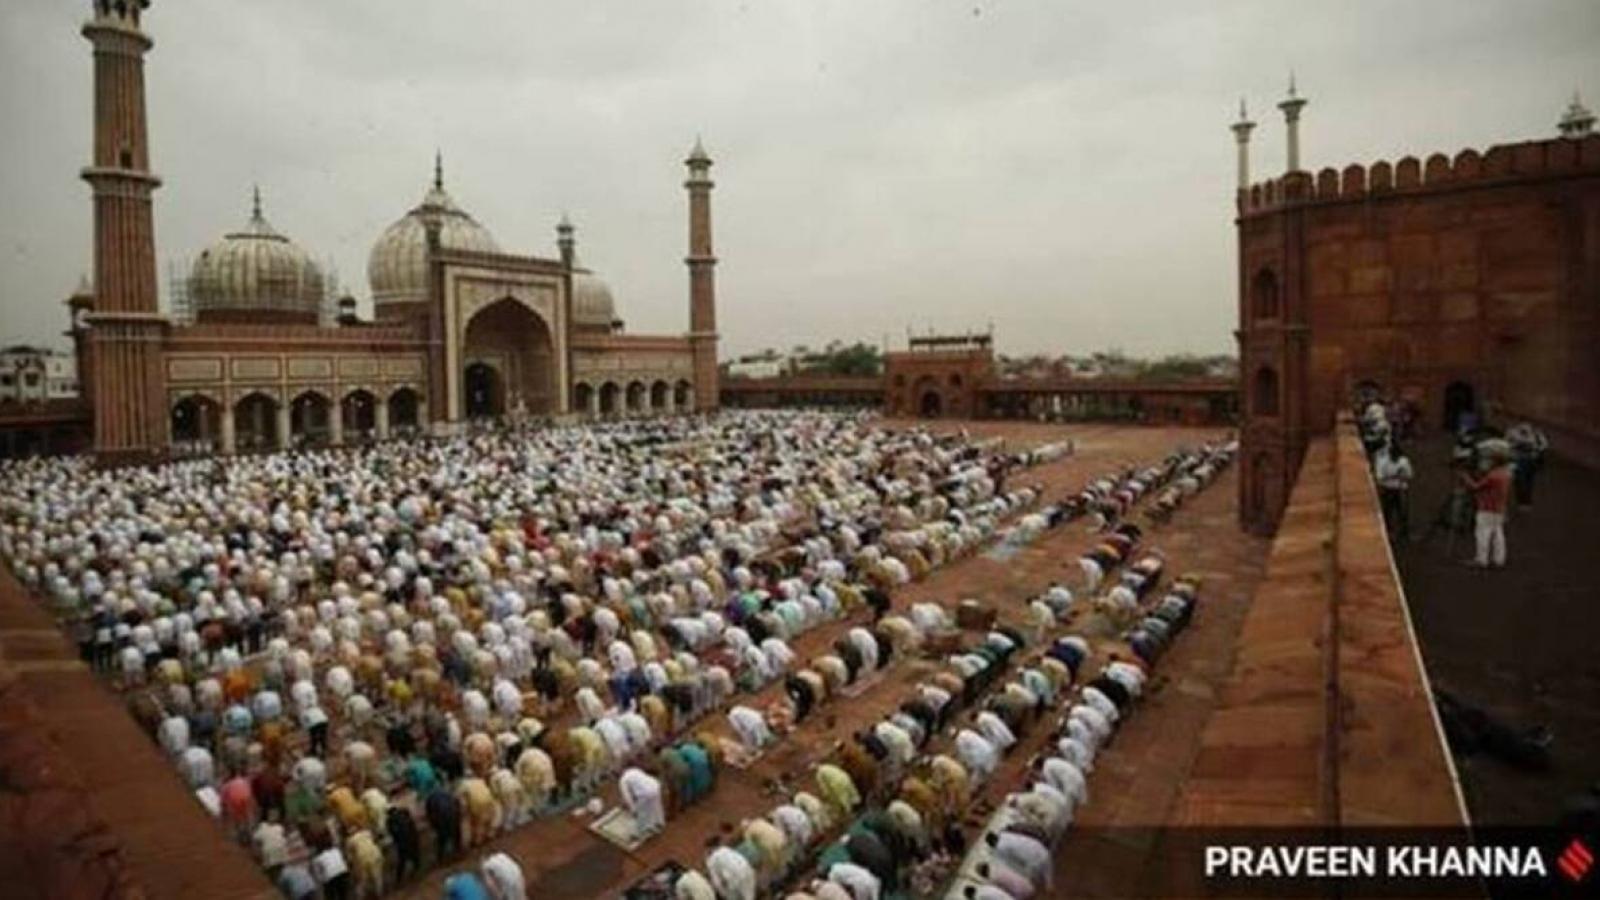 Người Hồi giáo đón lễ Eid al-Fitr giữa lúc dịch Covid-19 diễn biến phức tạp